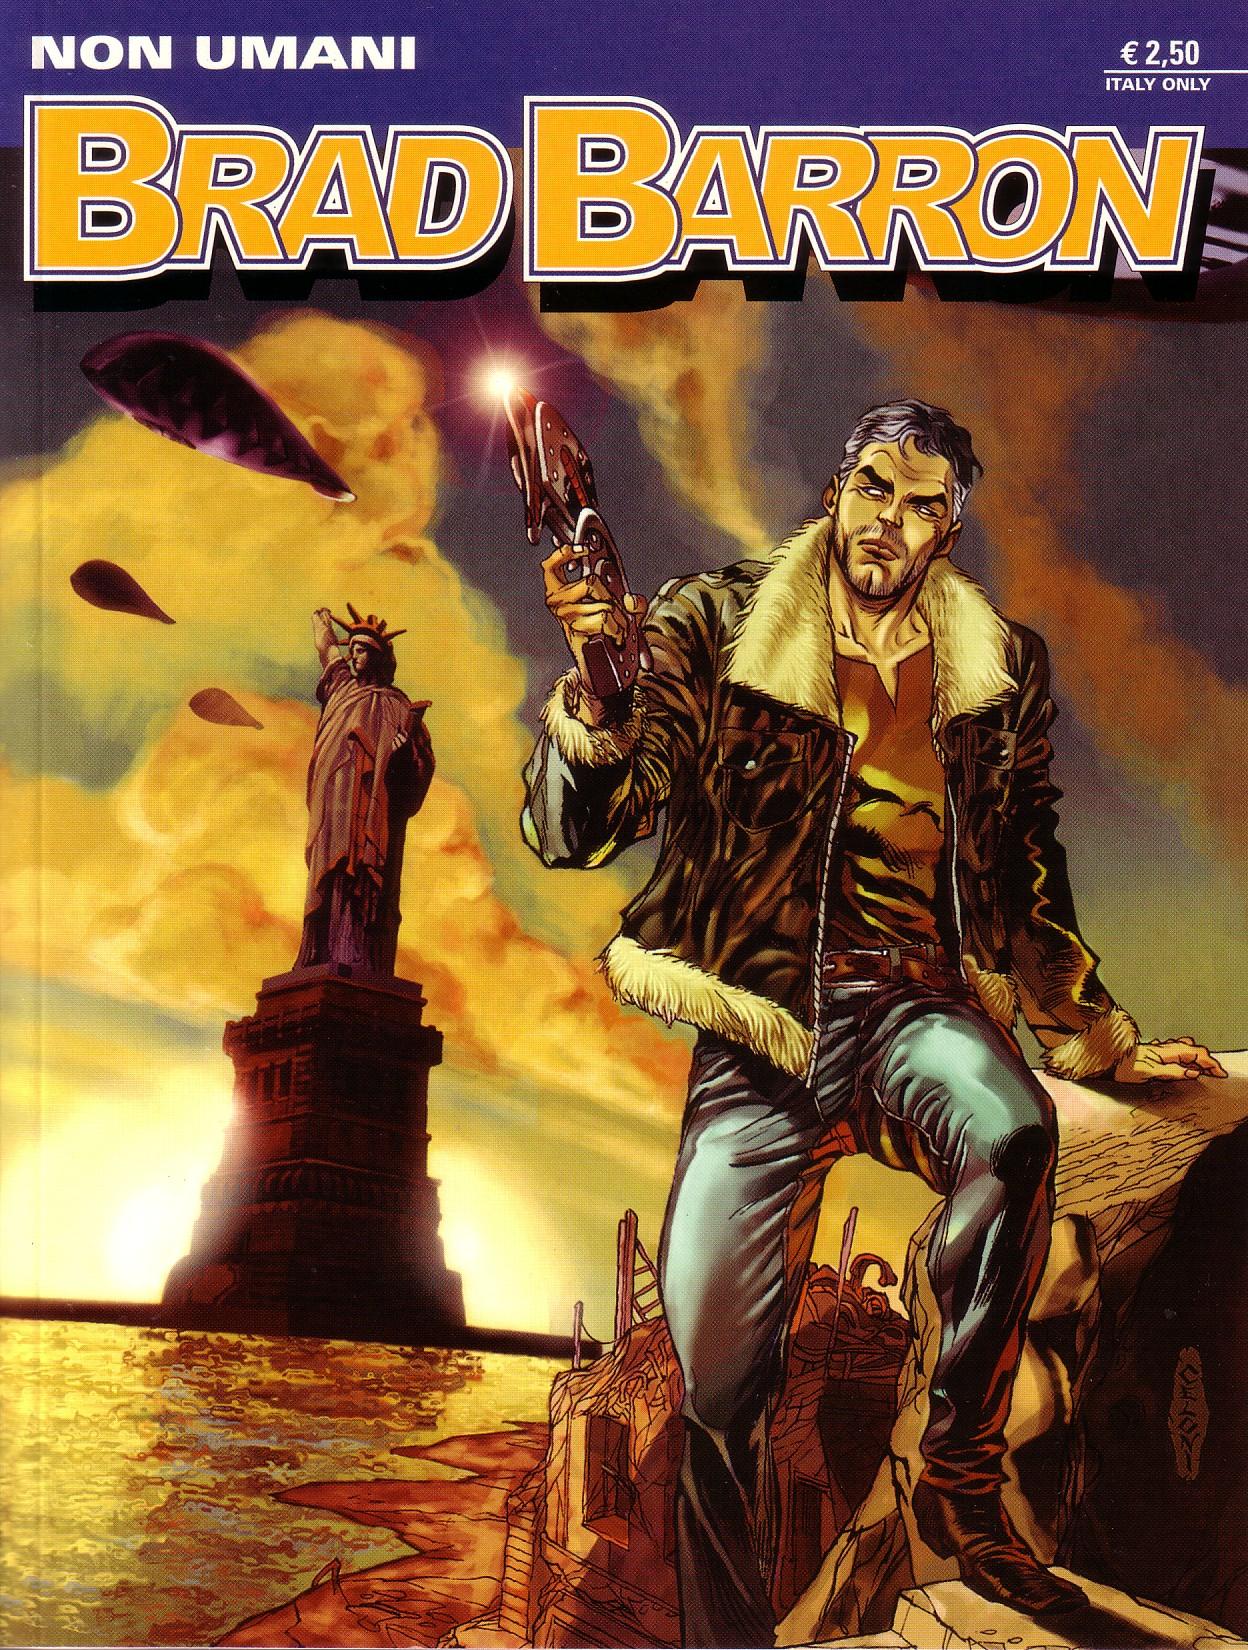 Brad Barron n. 1